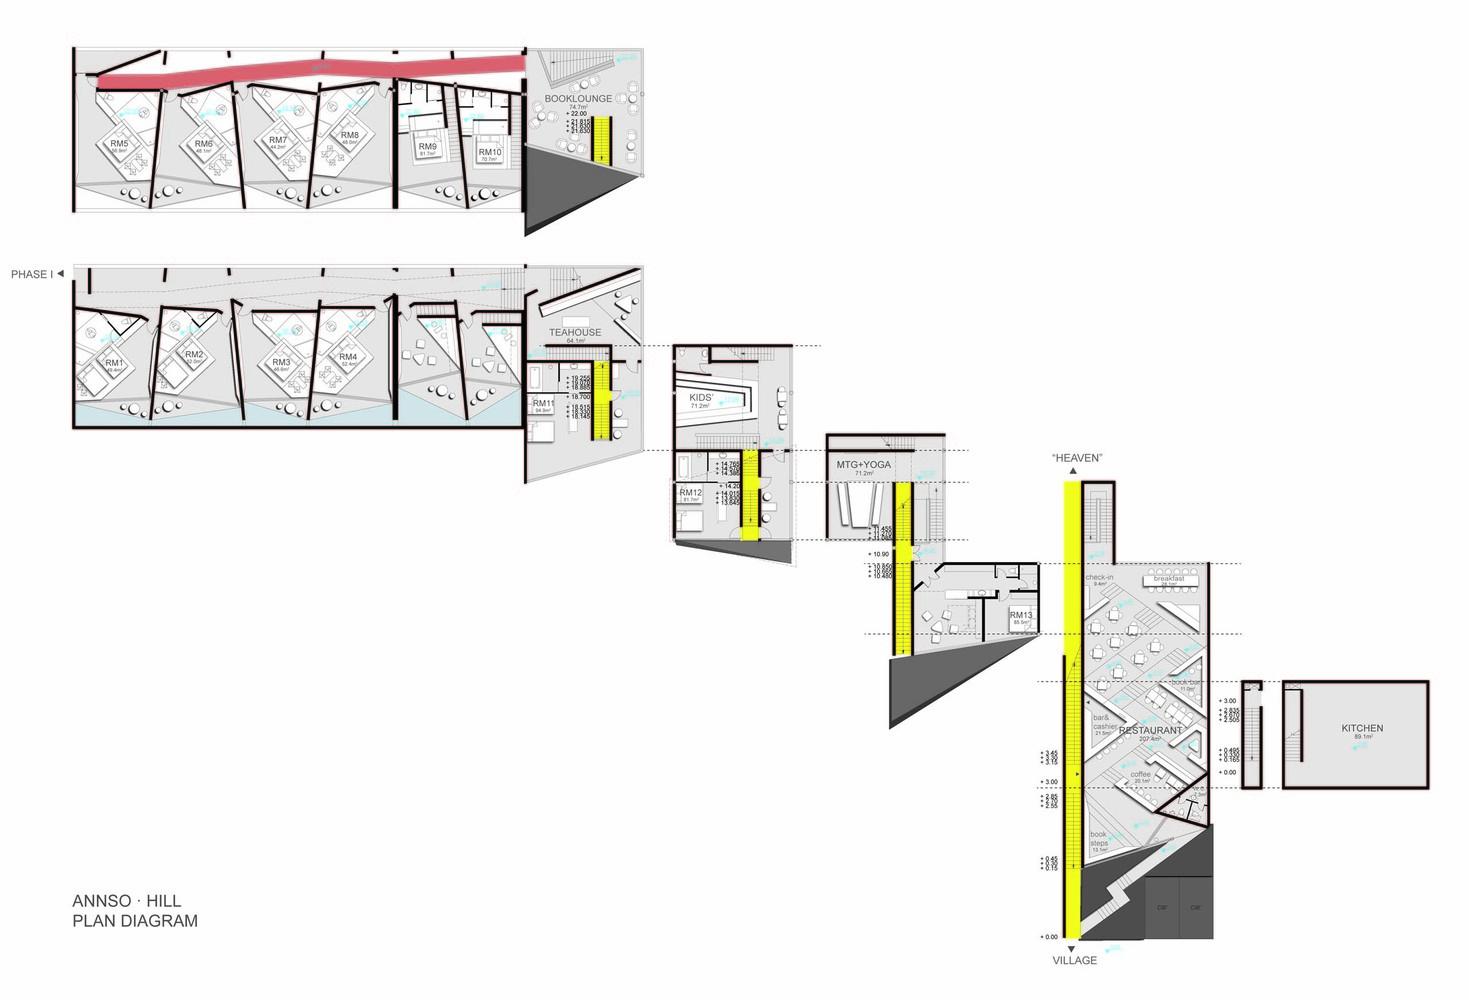 hight resolution of annso hill hotel studio qi plan